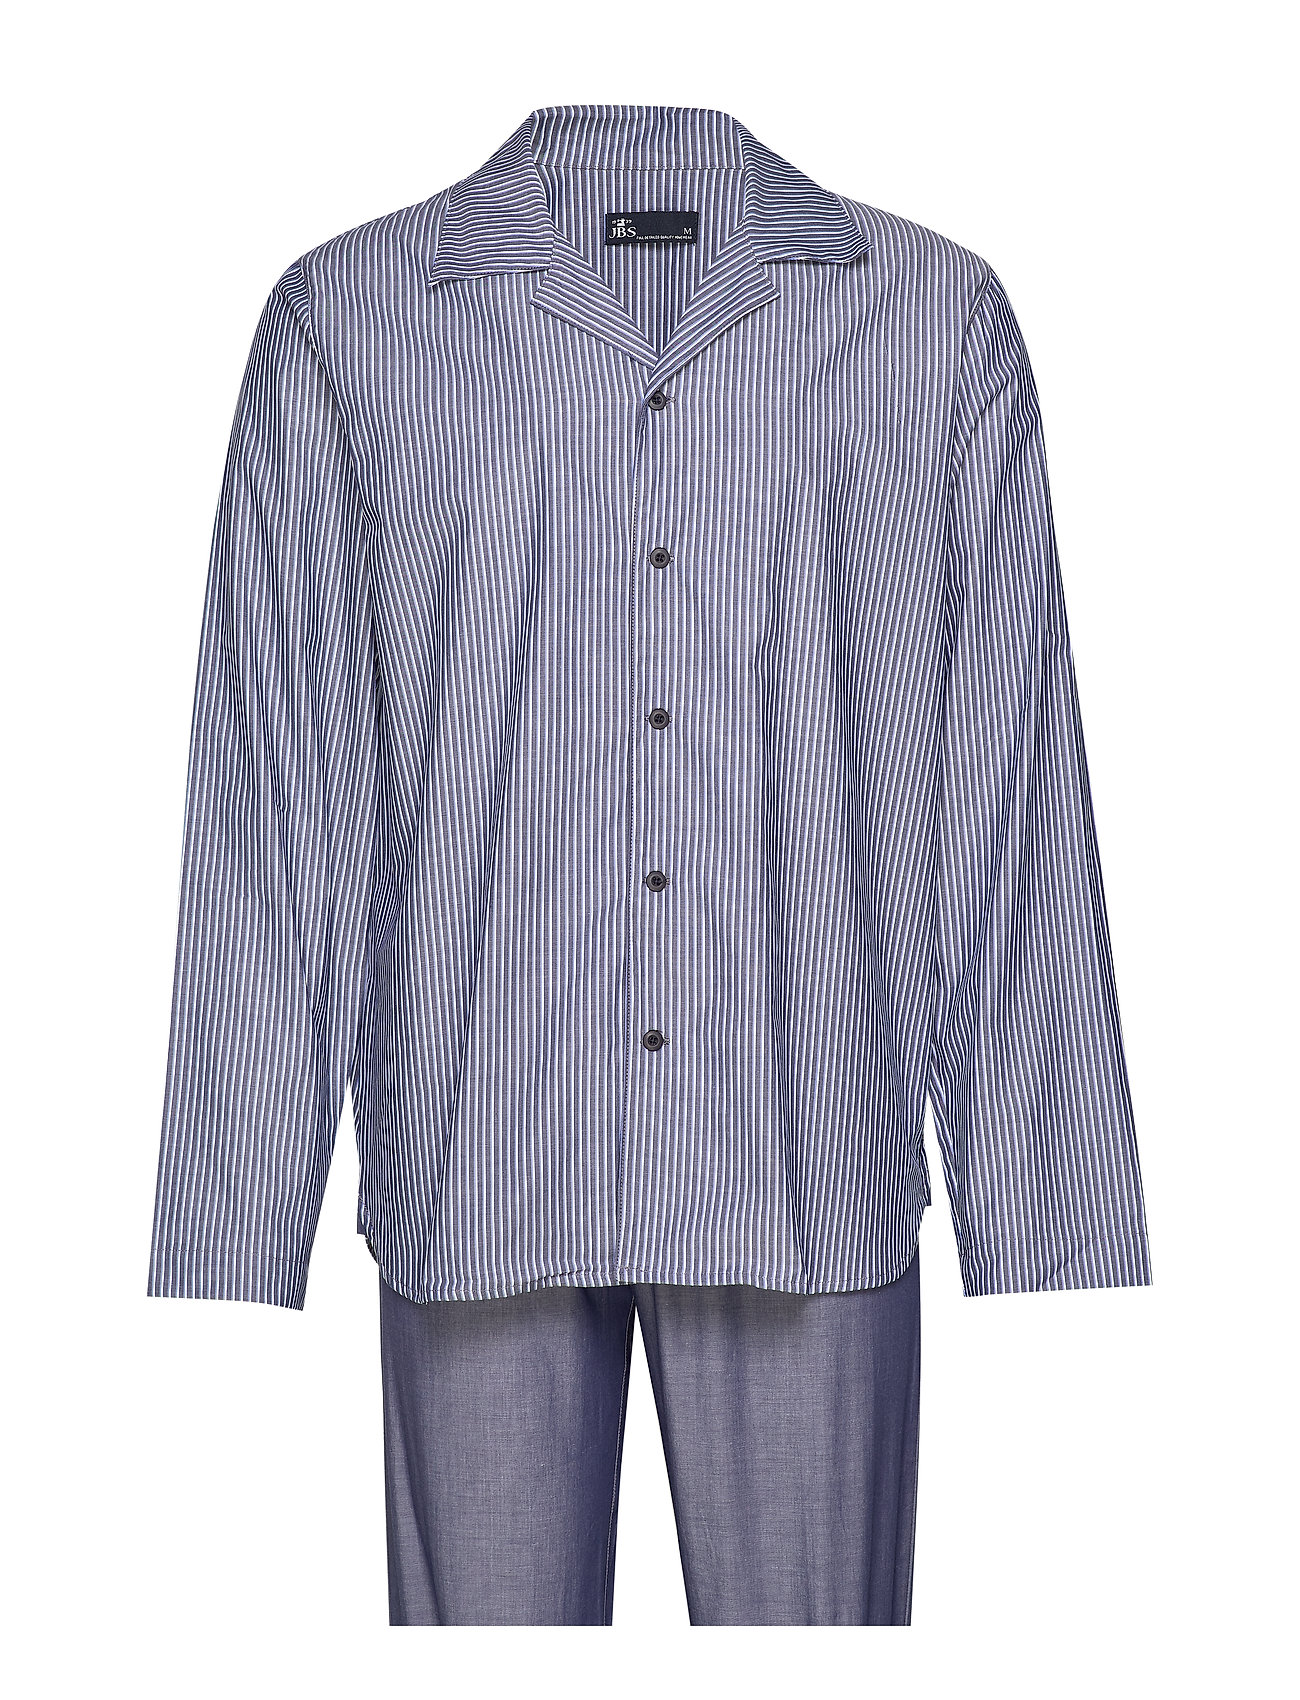 JBS JBS pyjamas woven - NAVY